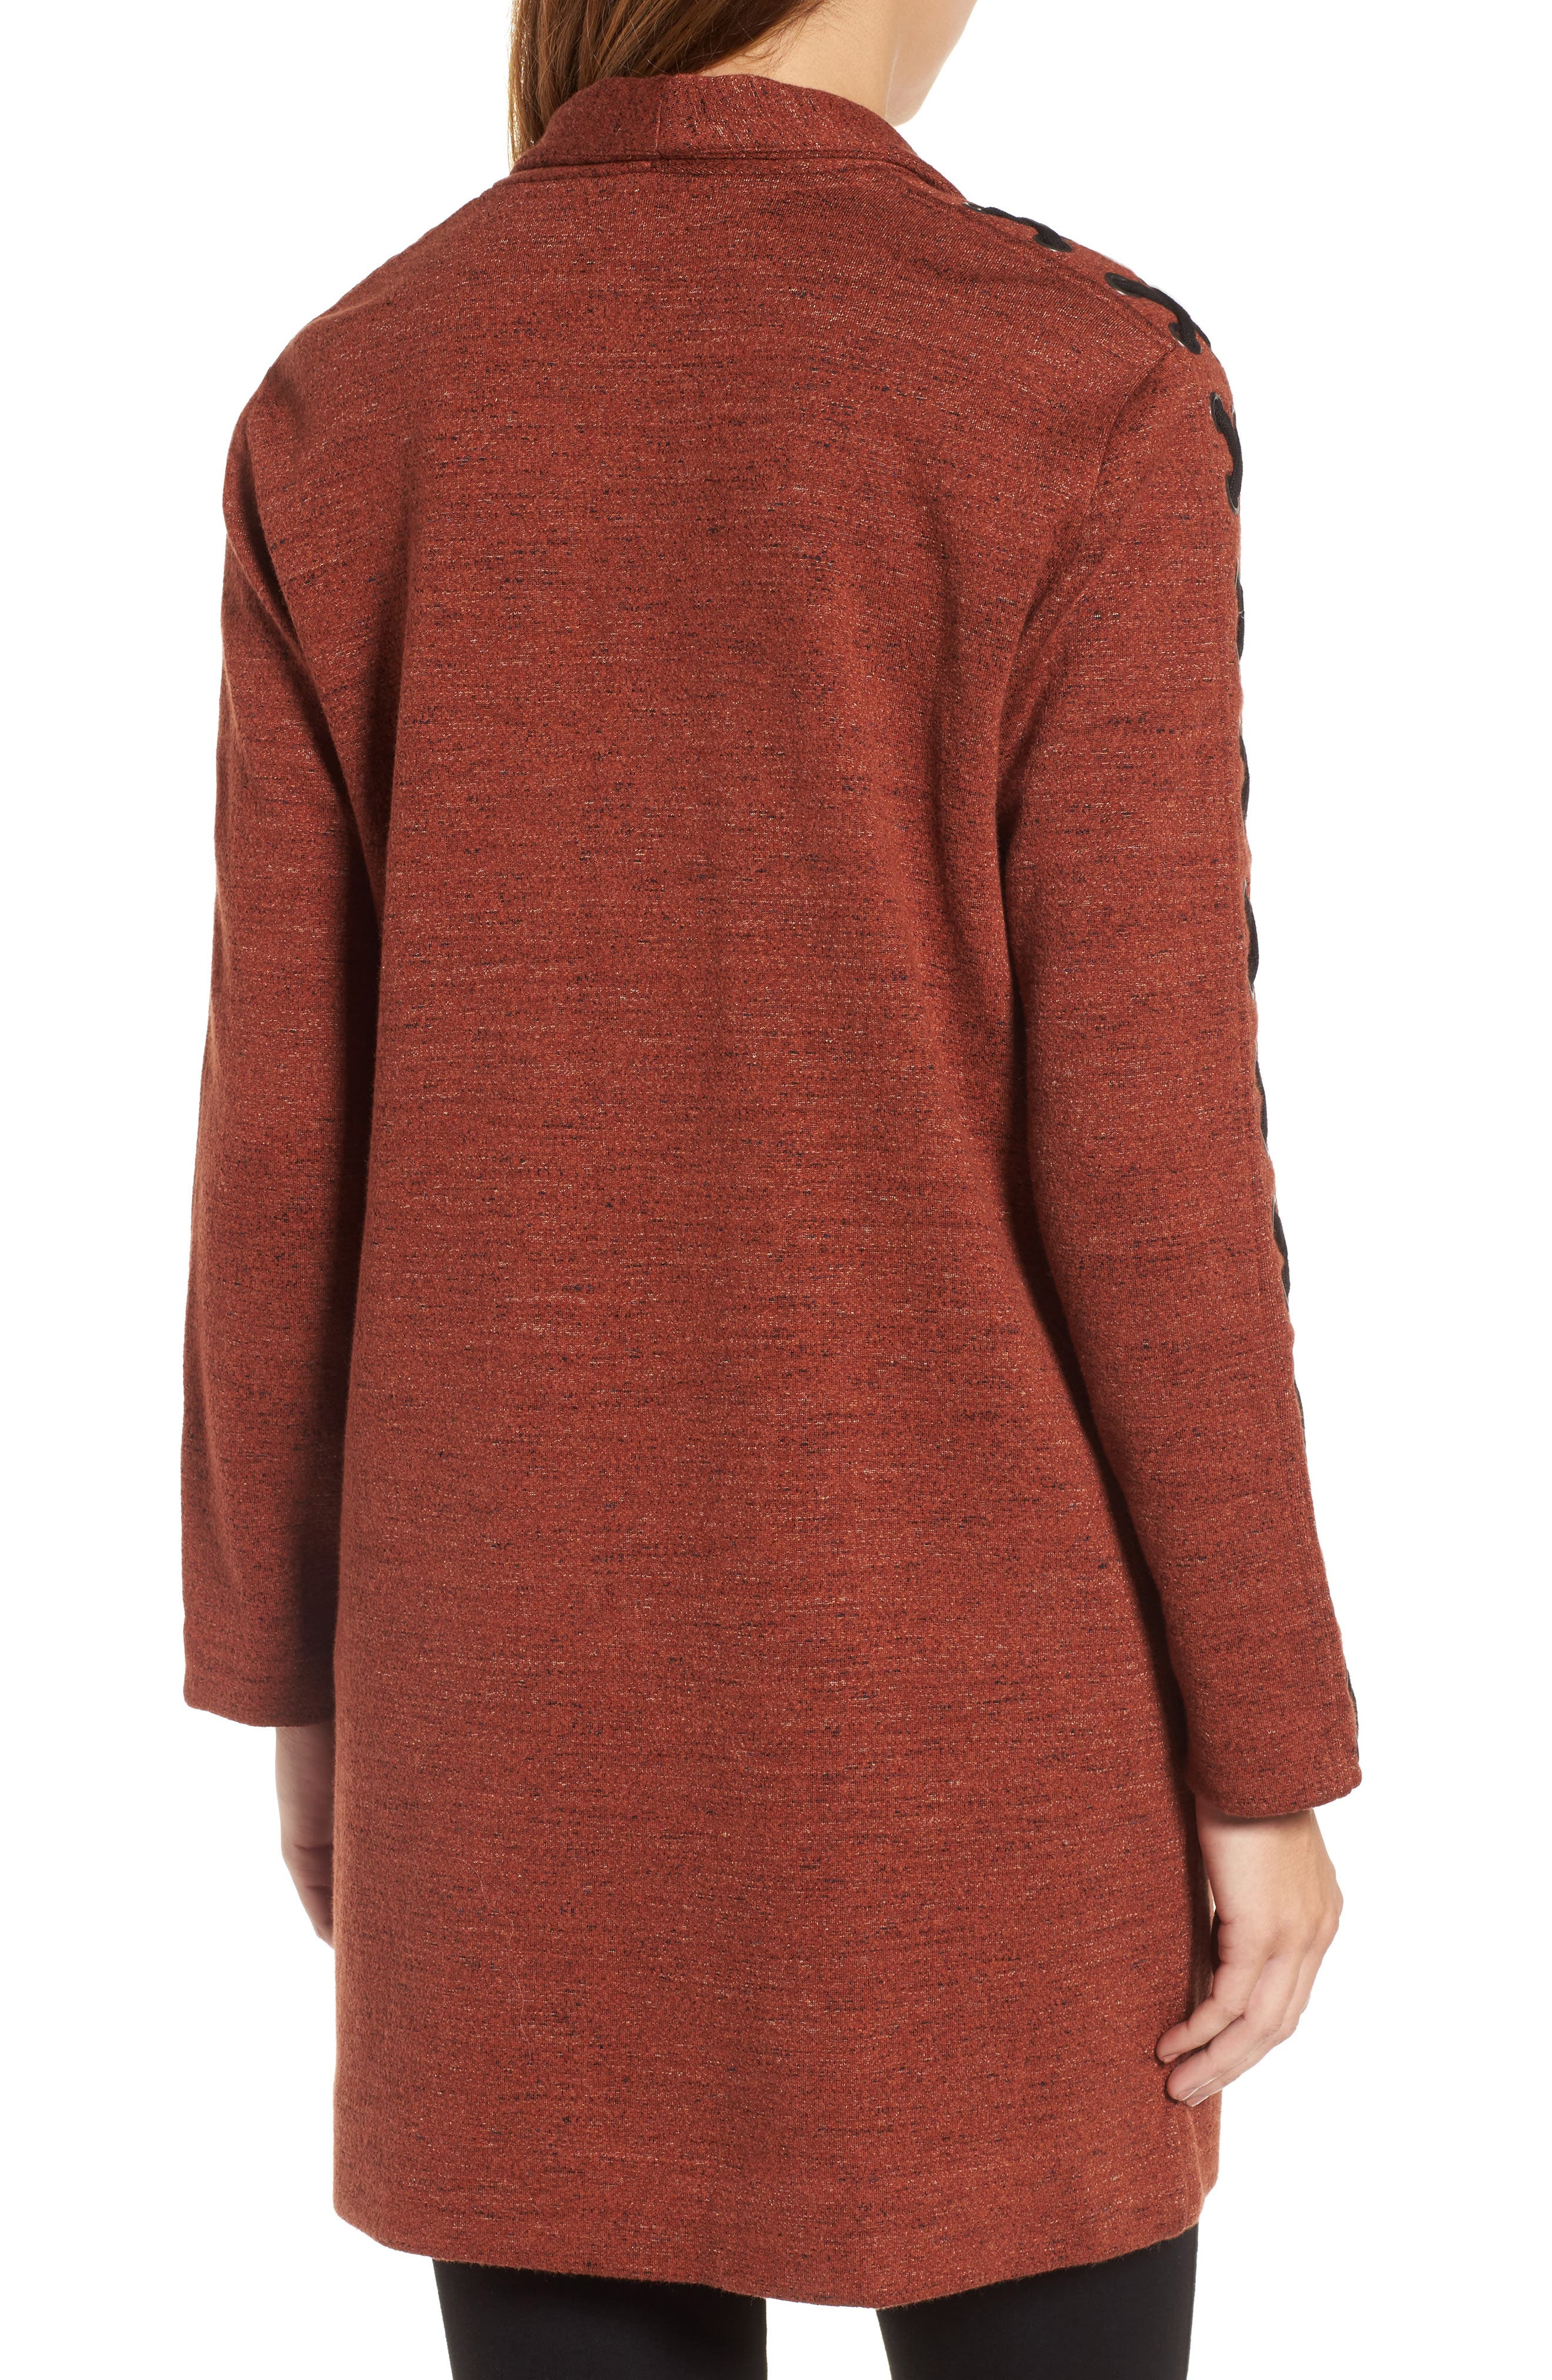 Alternate Image 2  - NIC+ZOE Crisscross Detail Knit Jacket (Regular & Petite)